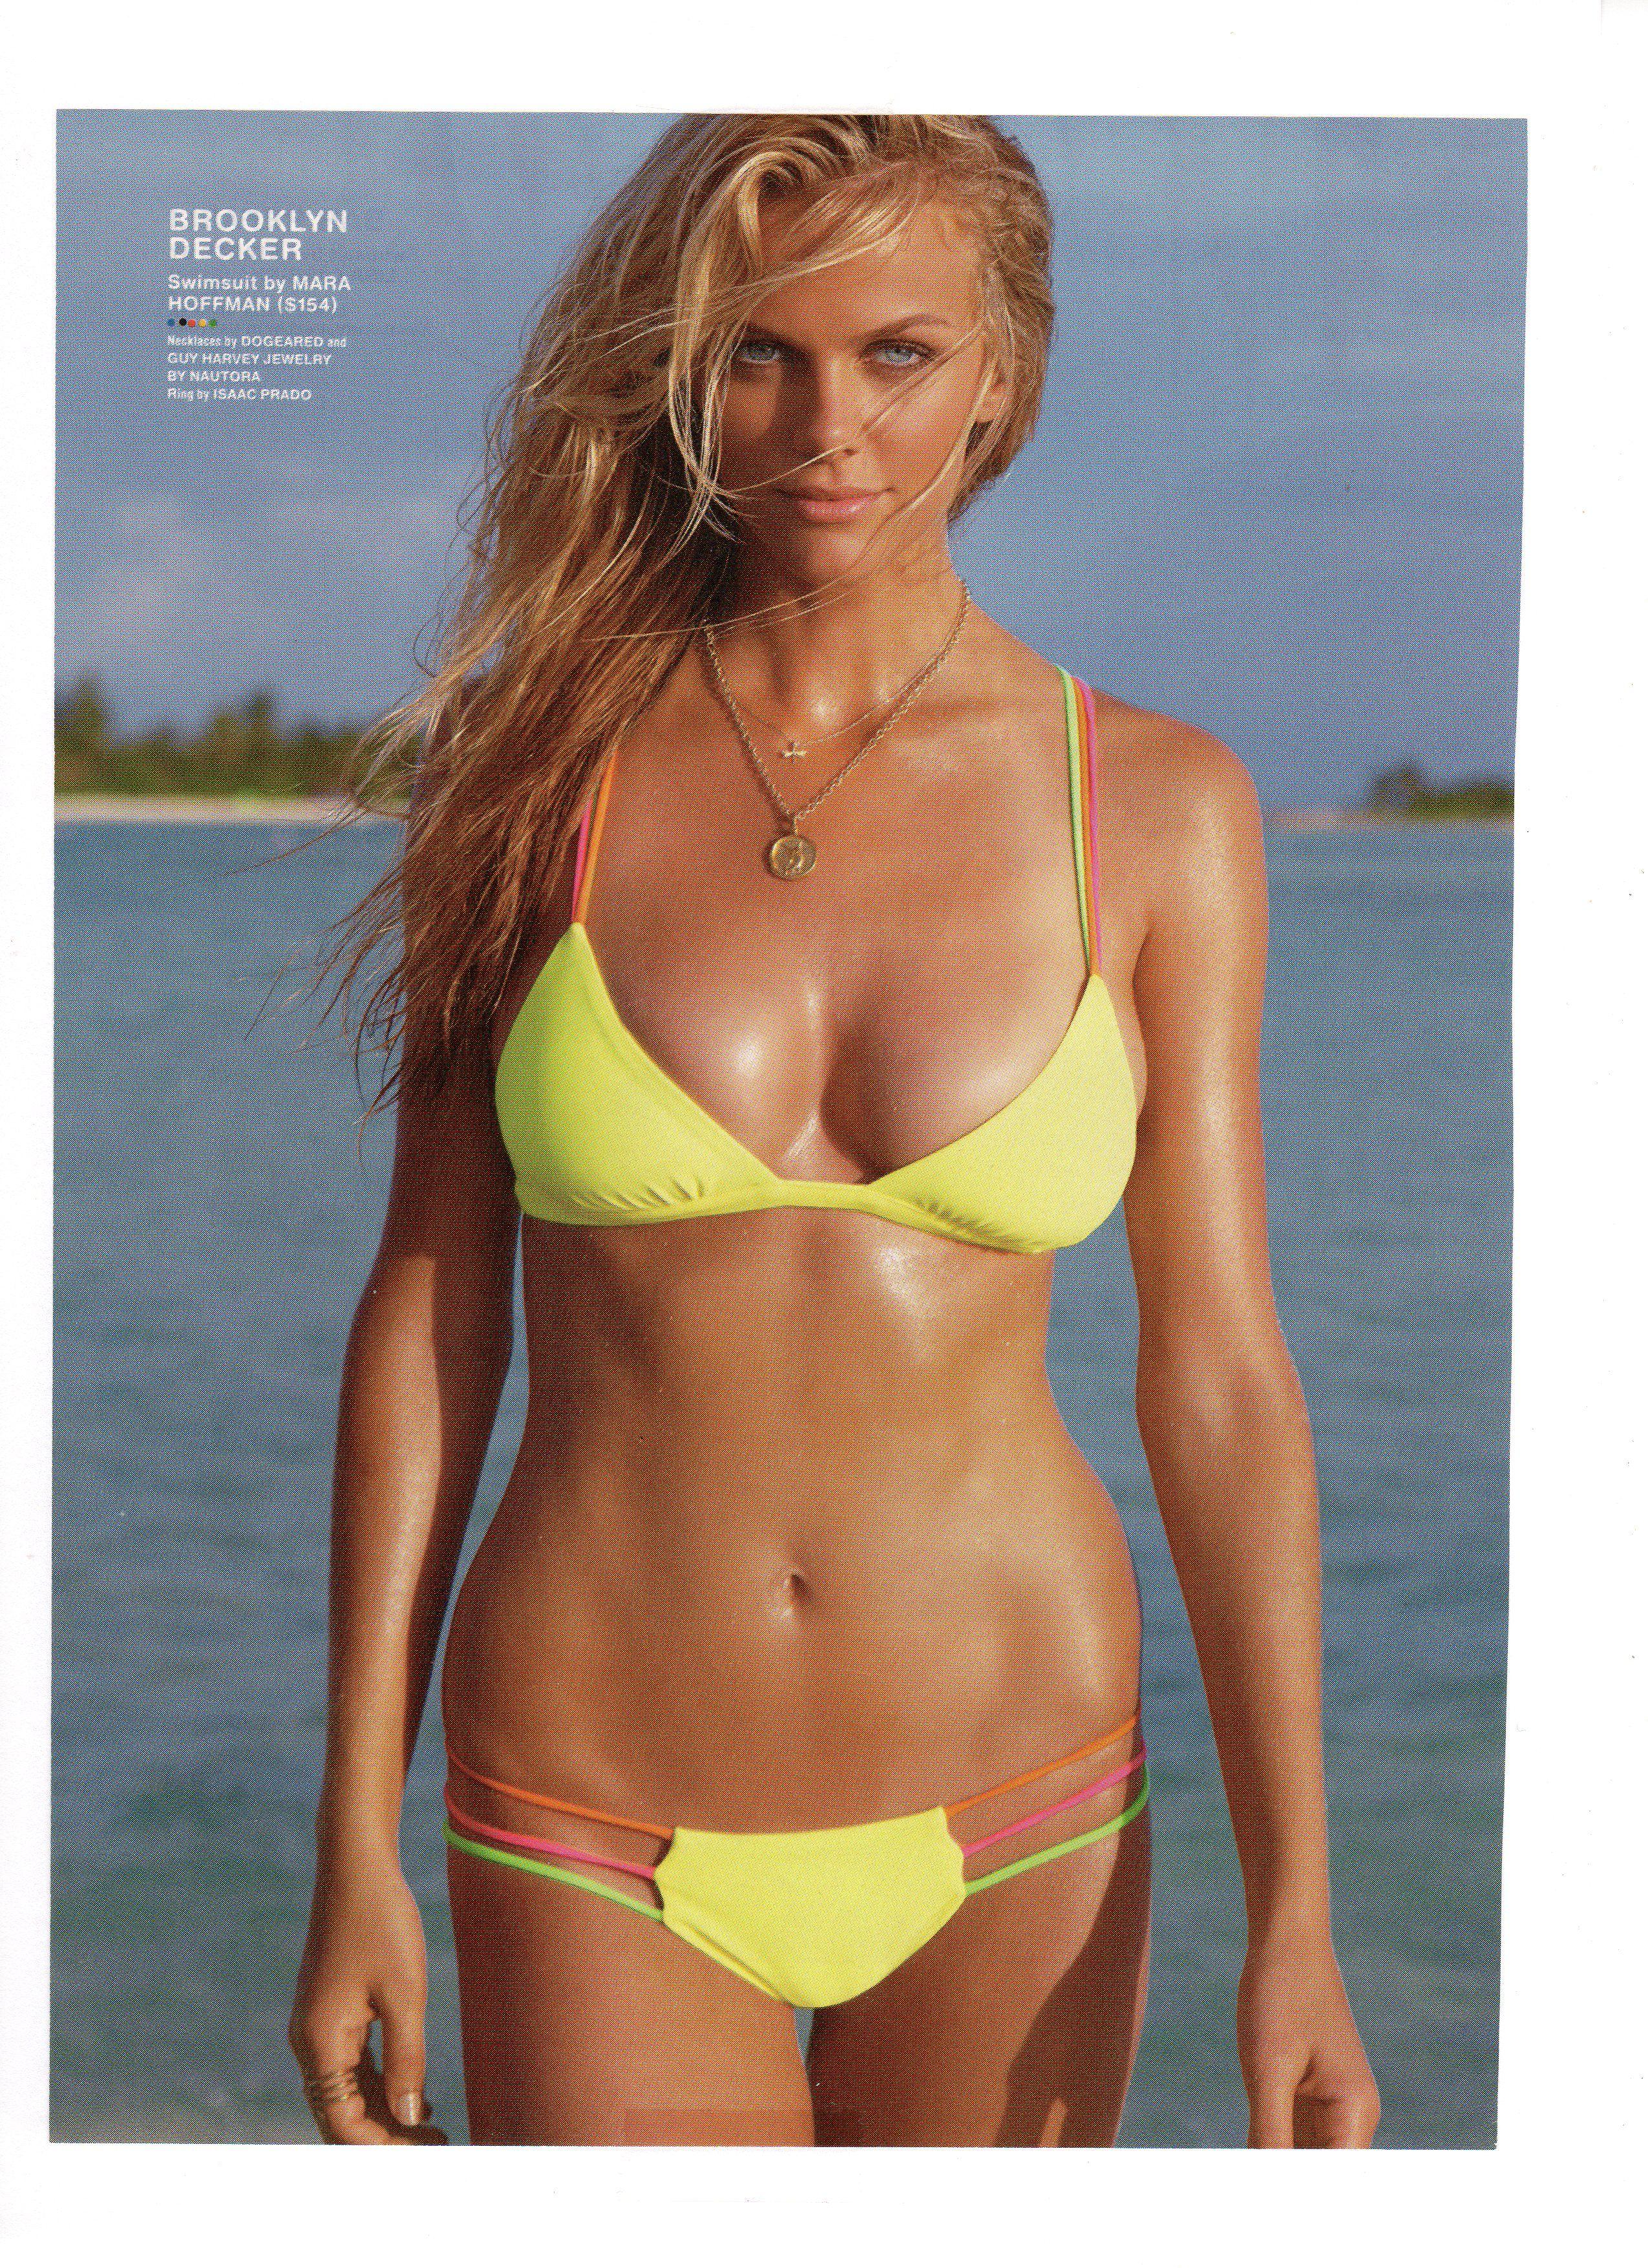 Full Sized Photo of brooklyn decker bikini cartwheels.jpg